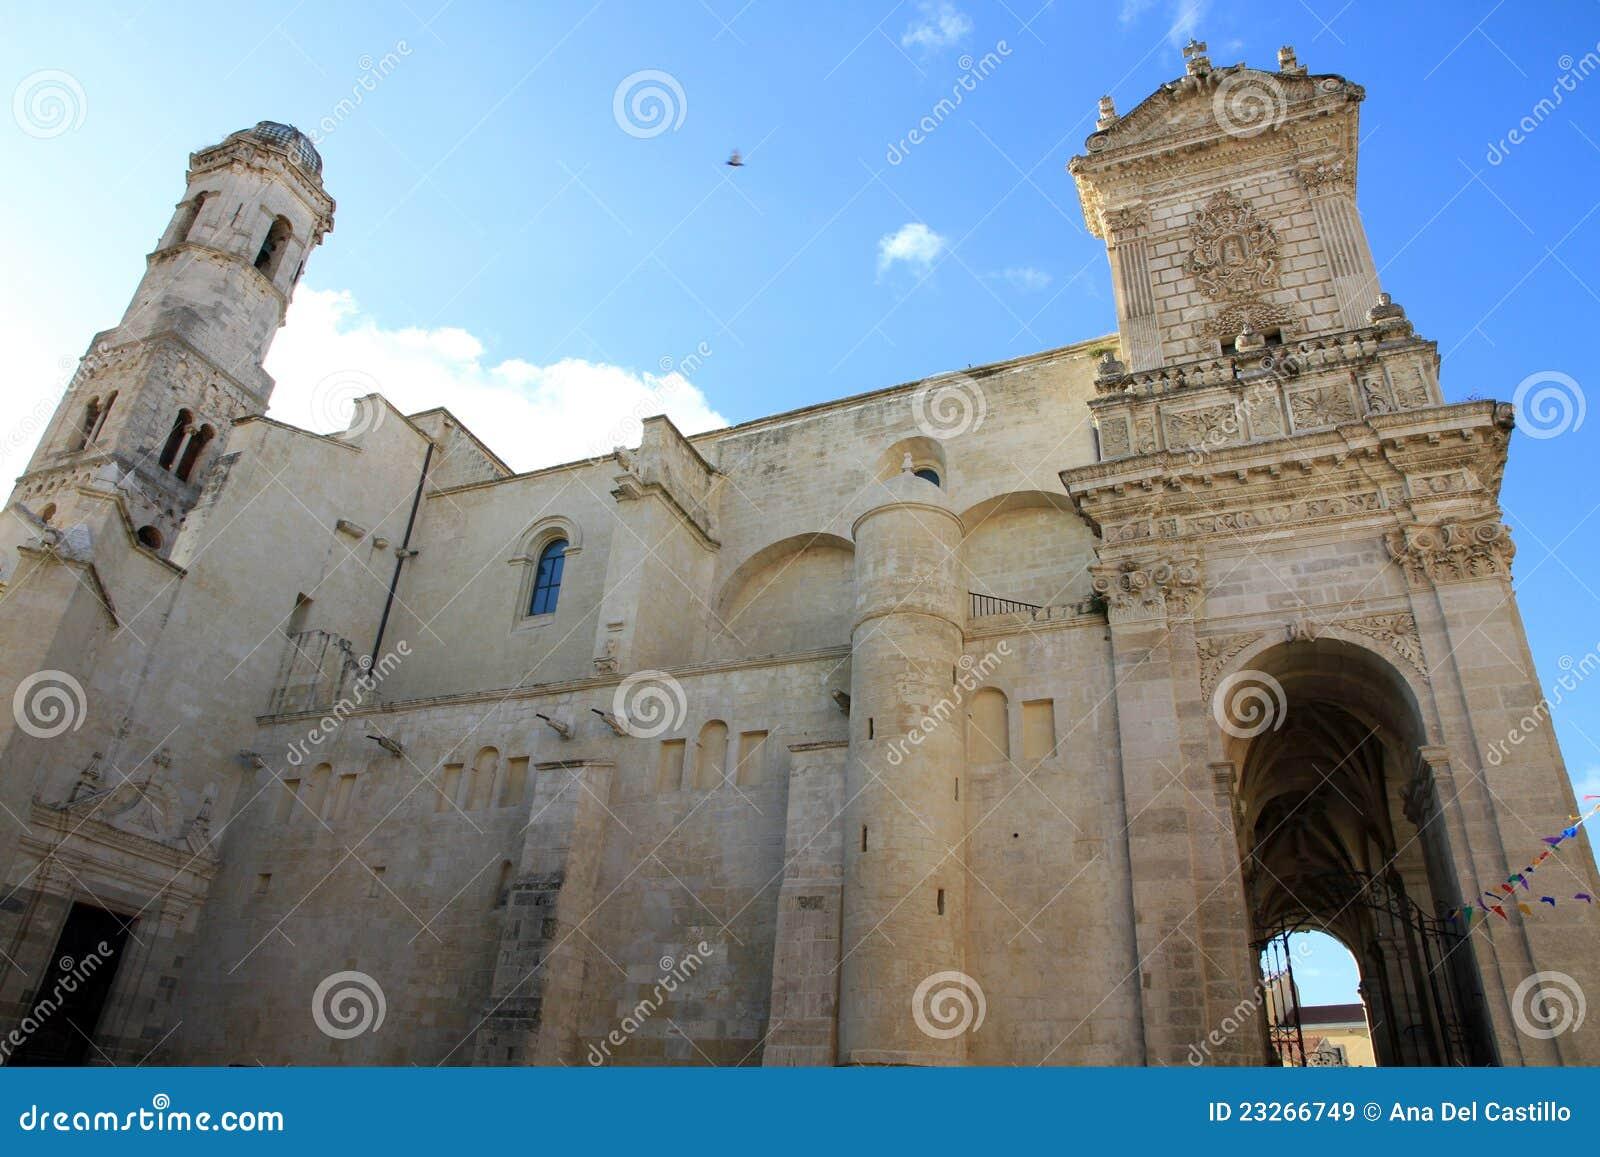 Sassari Italy  city photos gallery : Cathedral Building Sassari Italy Europe Royalty Free Stock Images ...